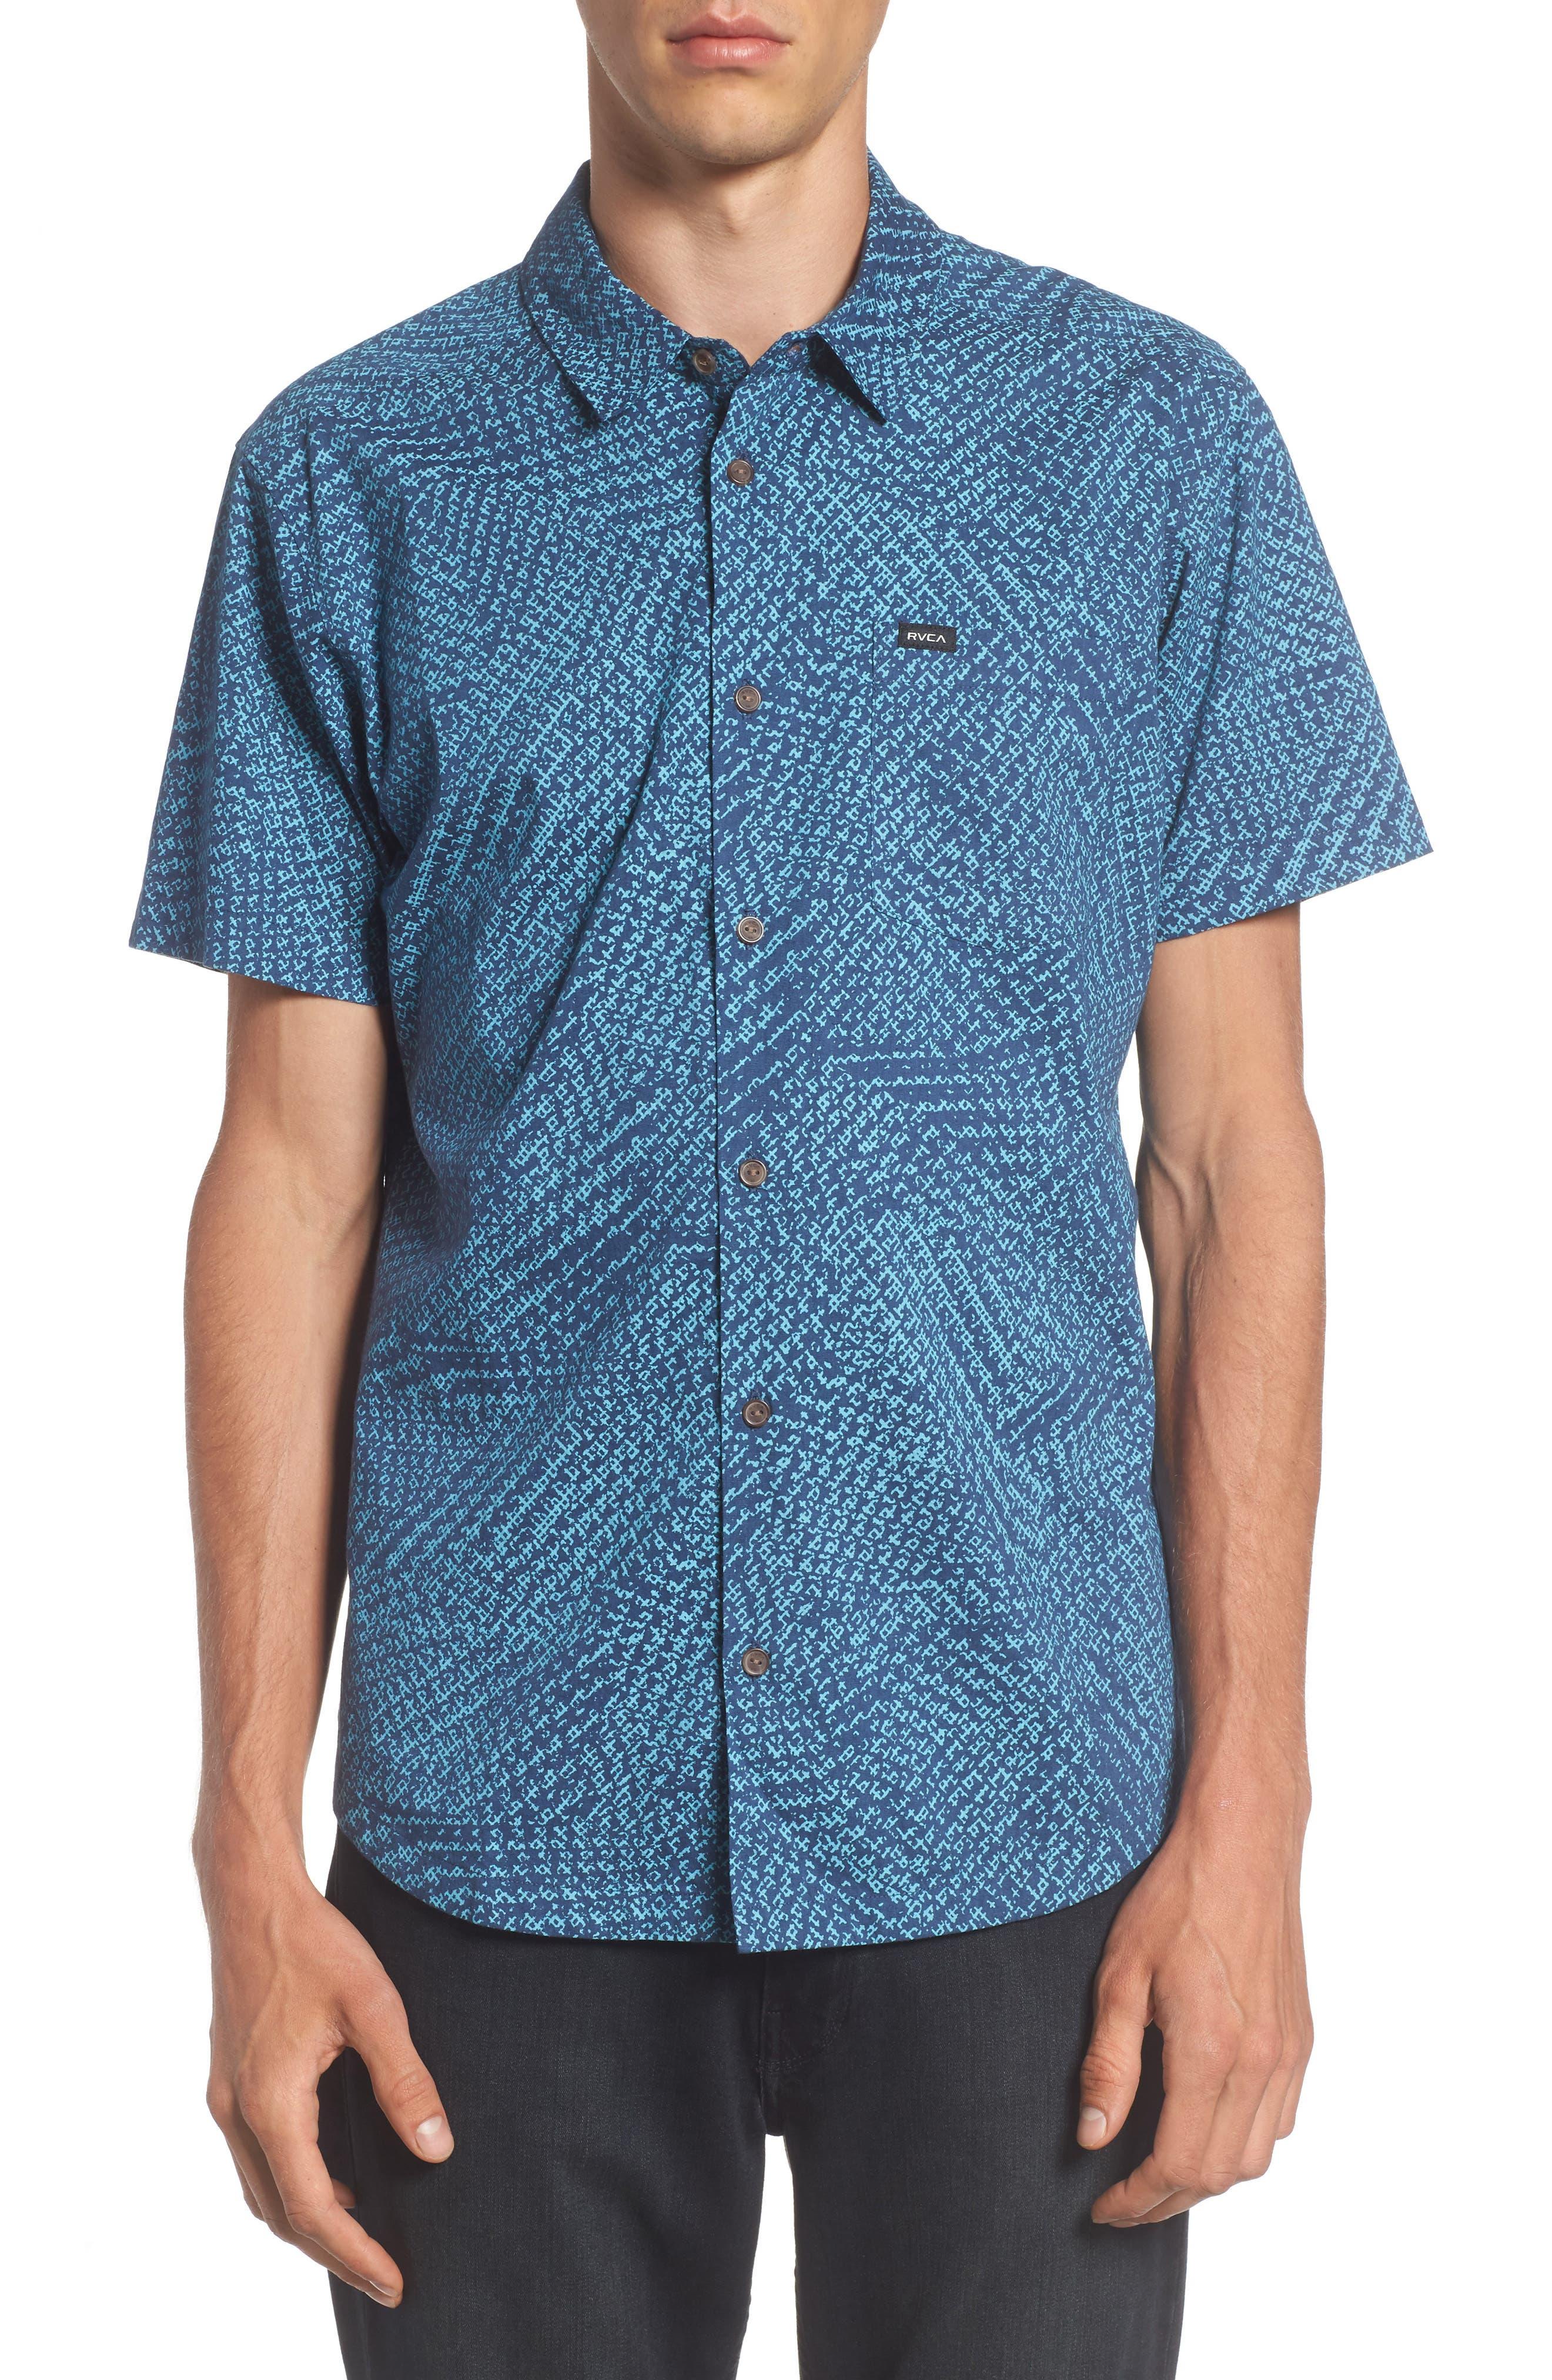 Main Image - RVCA Grid Woven Shirt